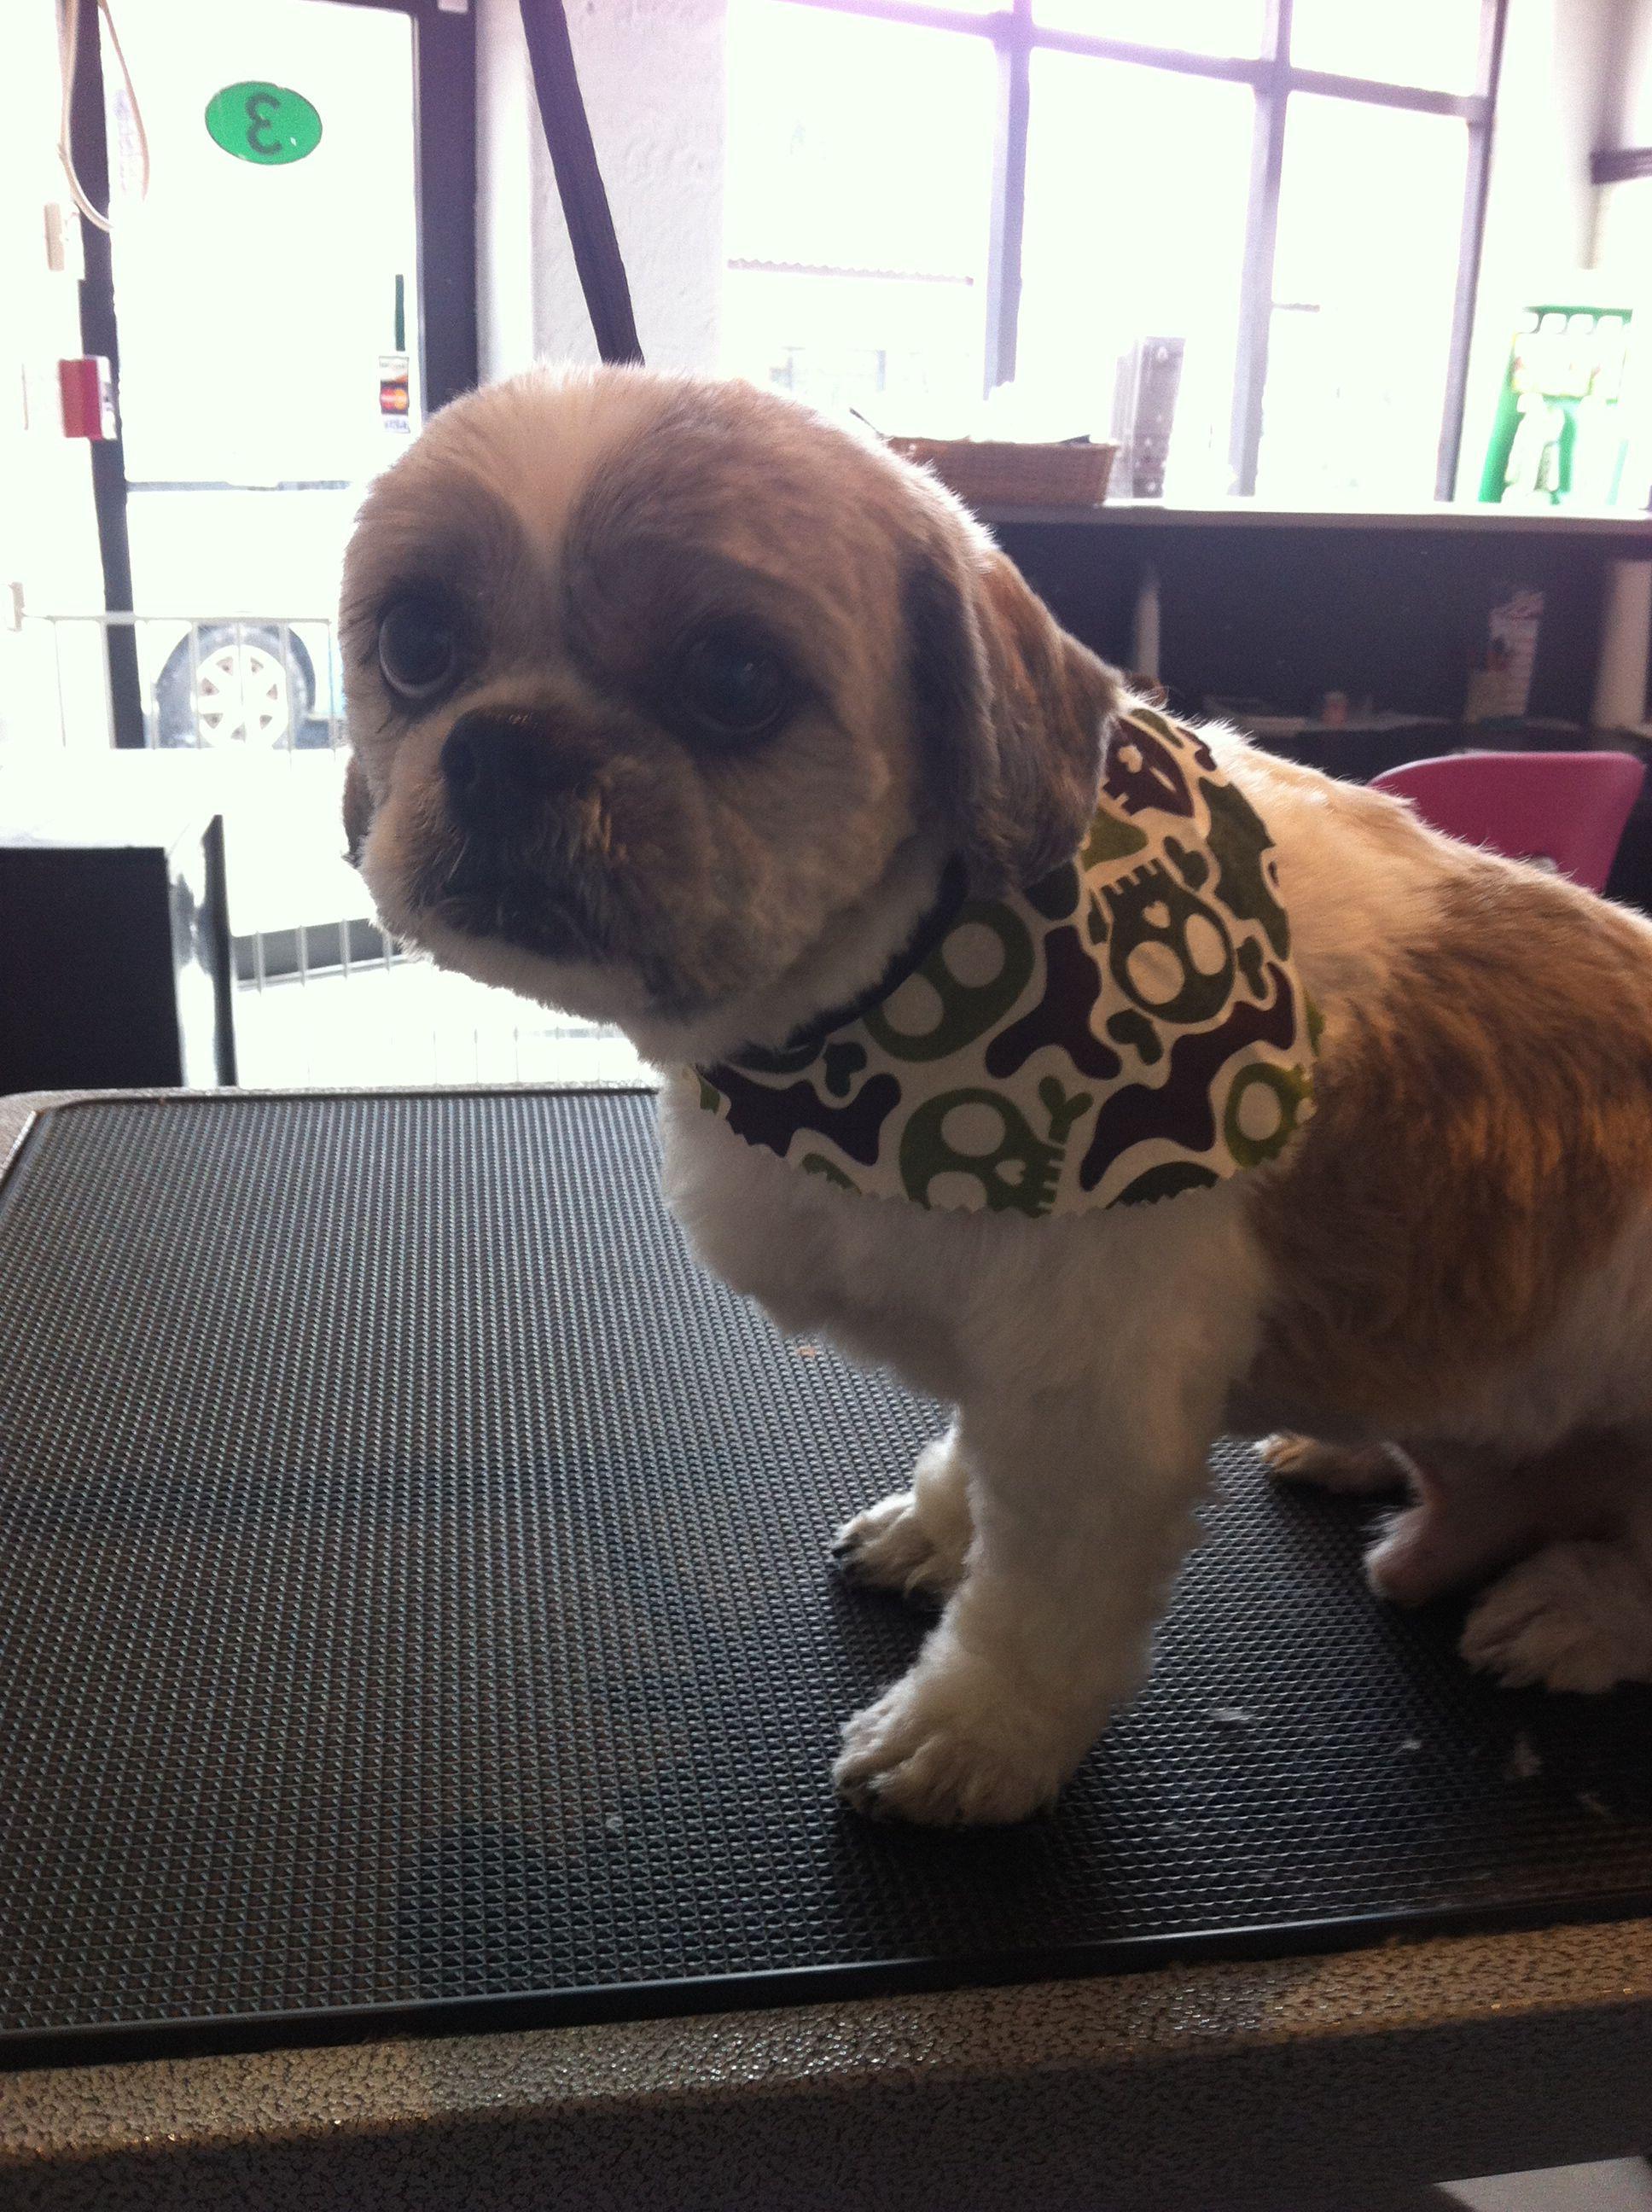 Shih Tzu 3 Blade Shaved Face Dog Grooming Styles Dog Runs